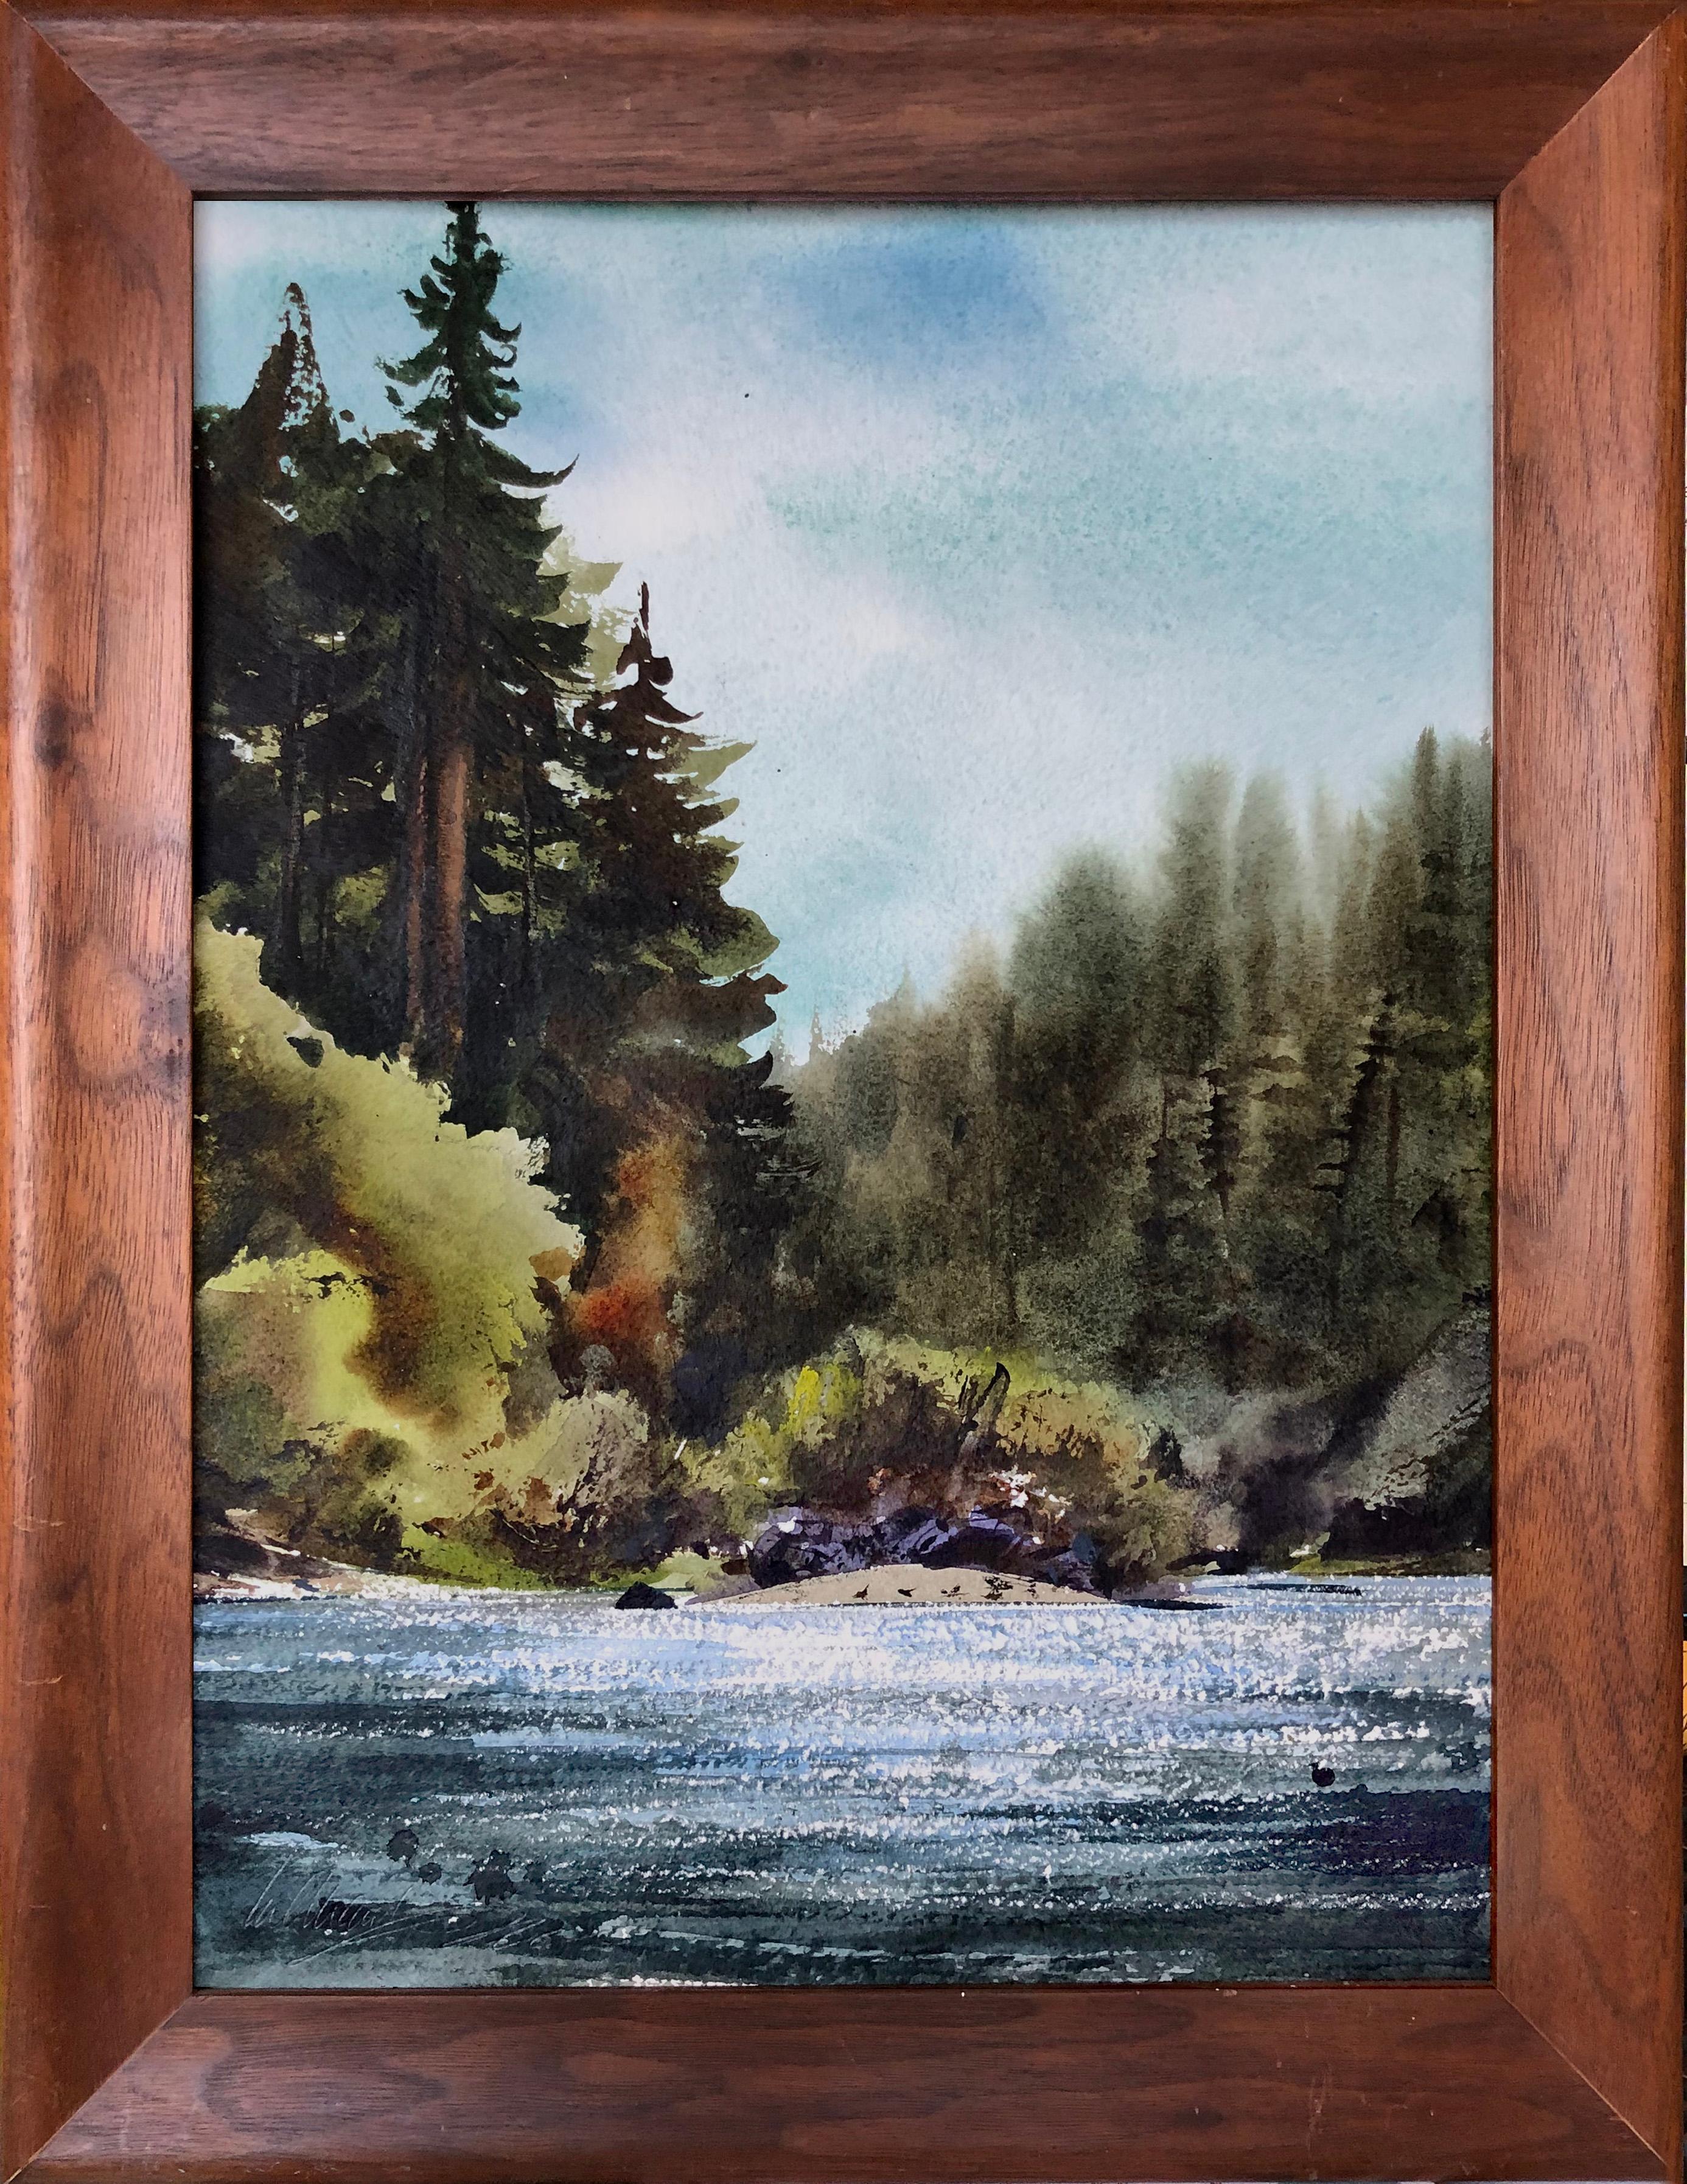 Russian River Landscape at Bohemian Grove, California